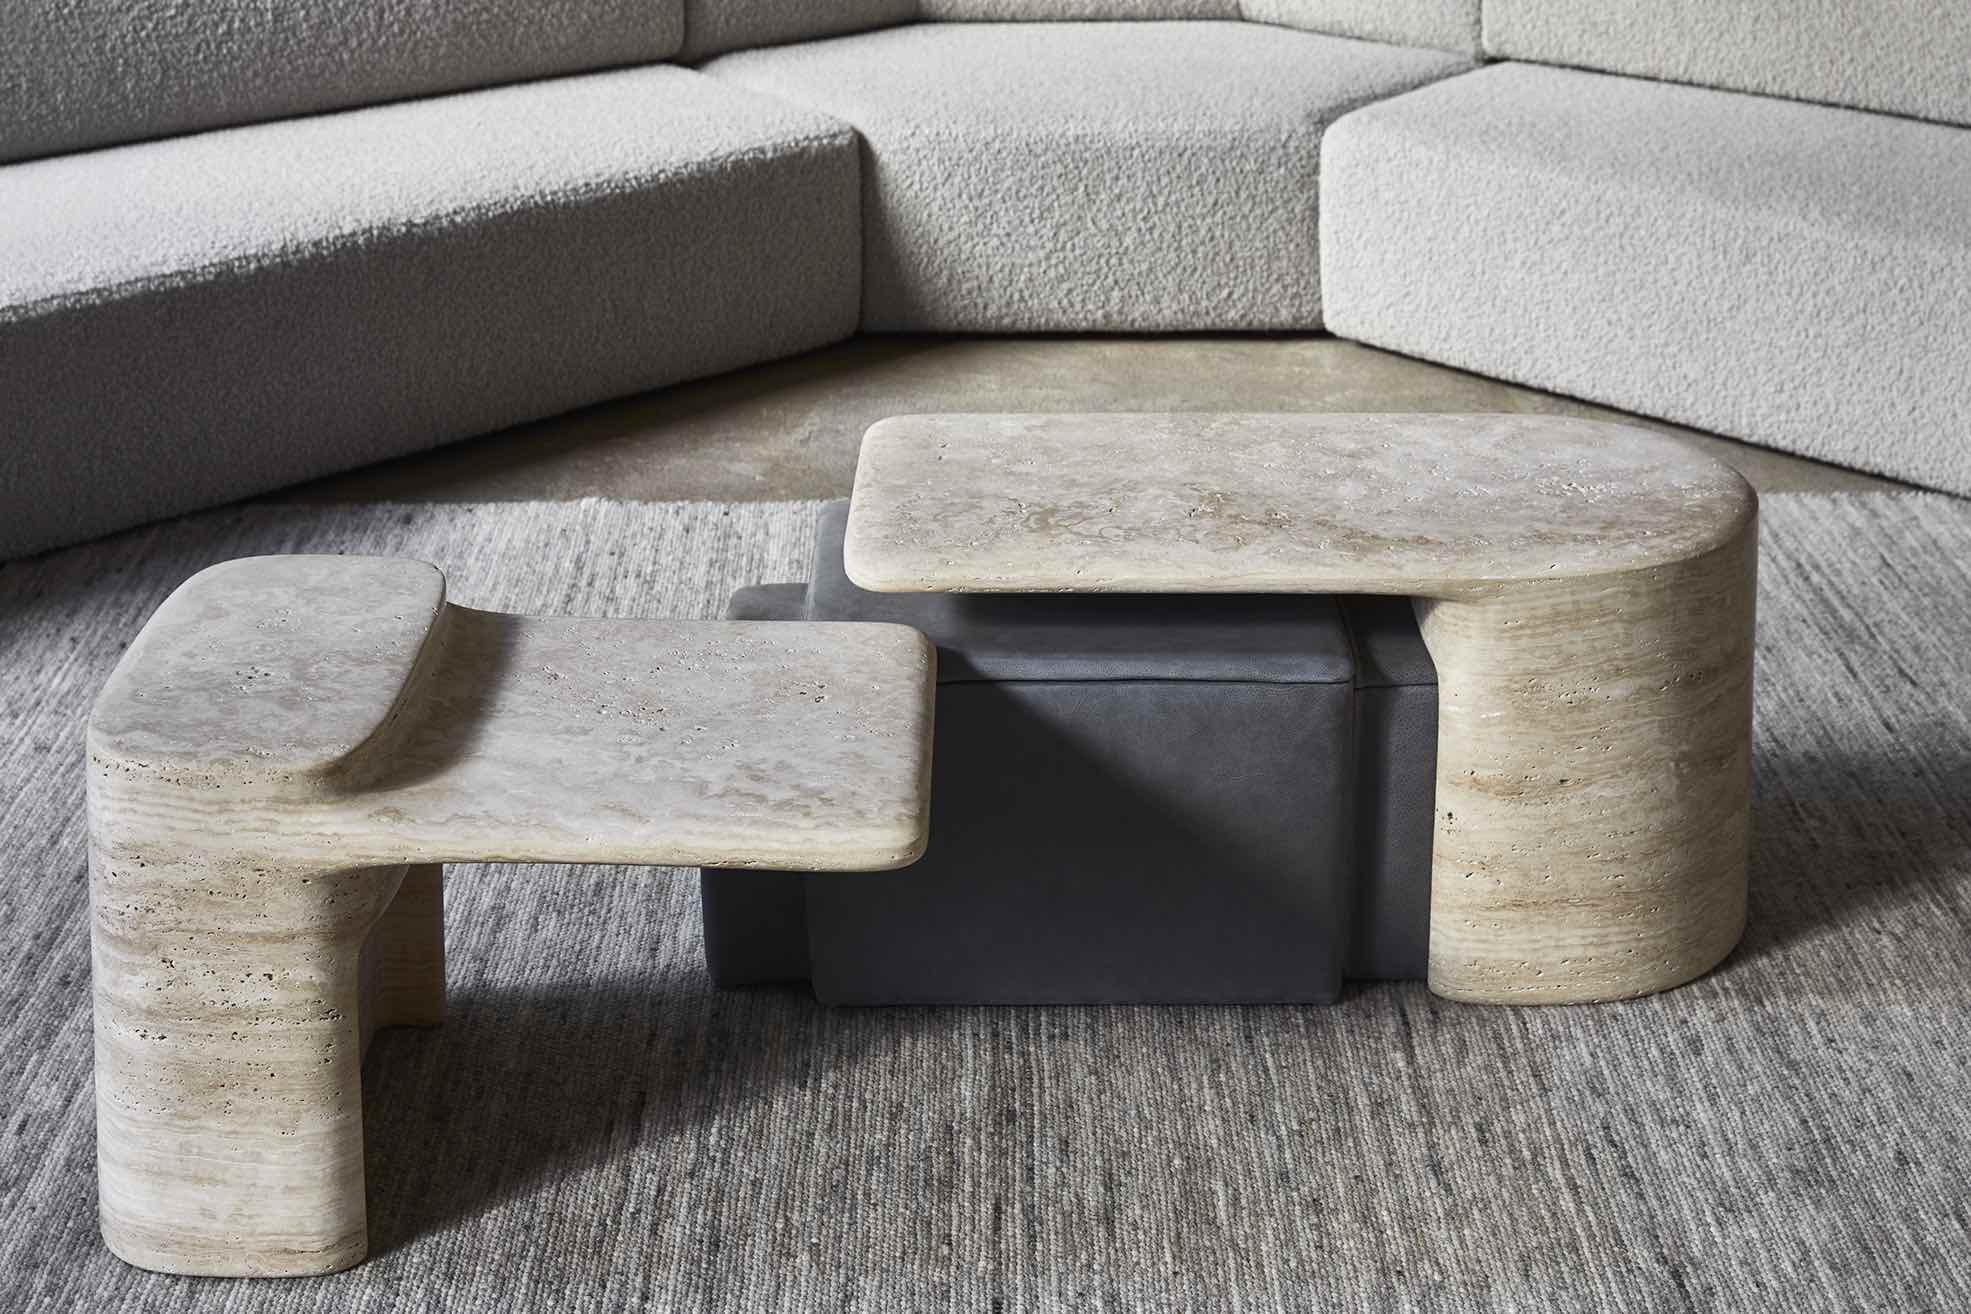 FORMATION-LOW-TABLE-design-Dan_Yeffet-Collection-Particulière